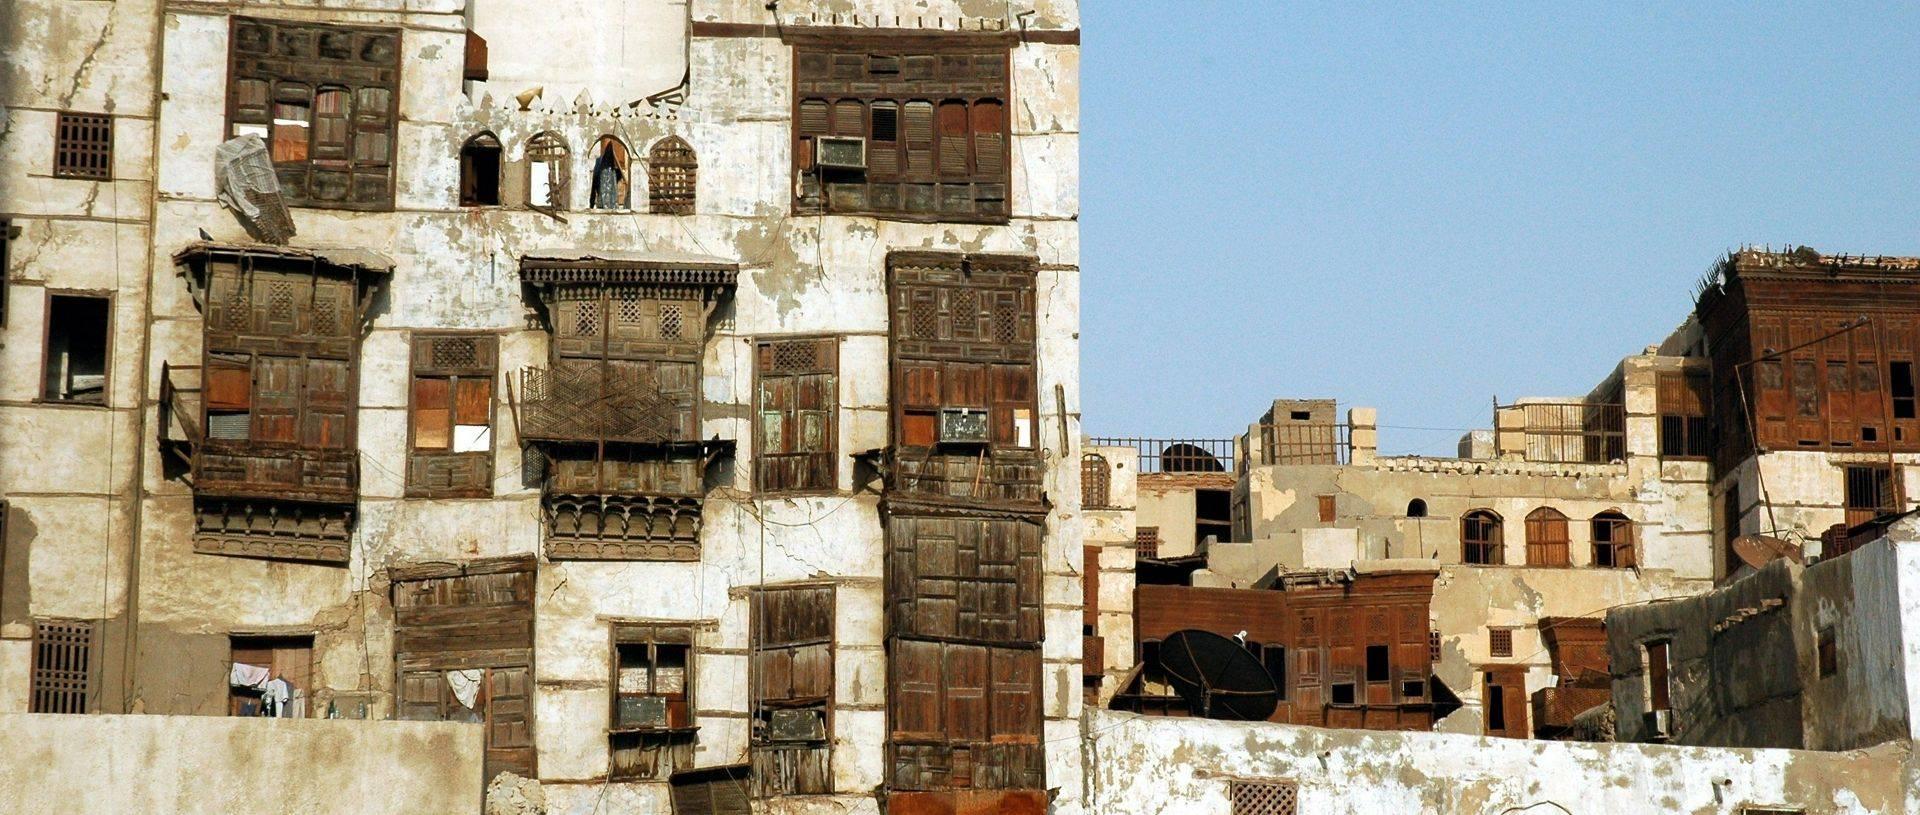 Old Coral Houses - Jeddah.jpg